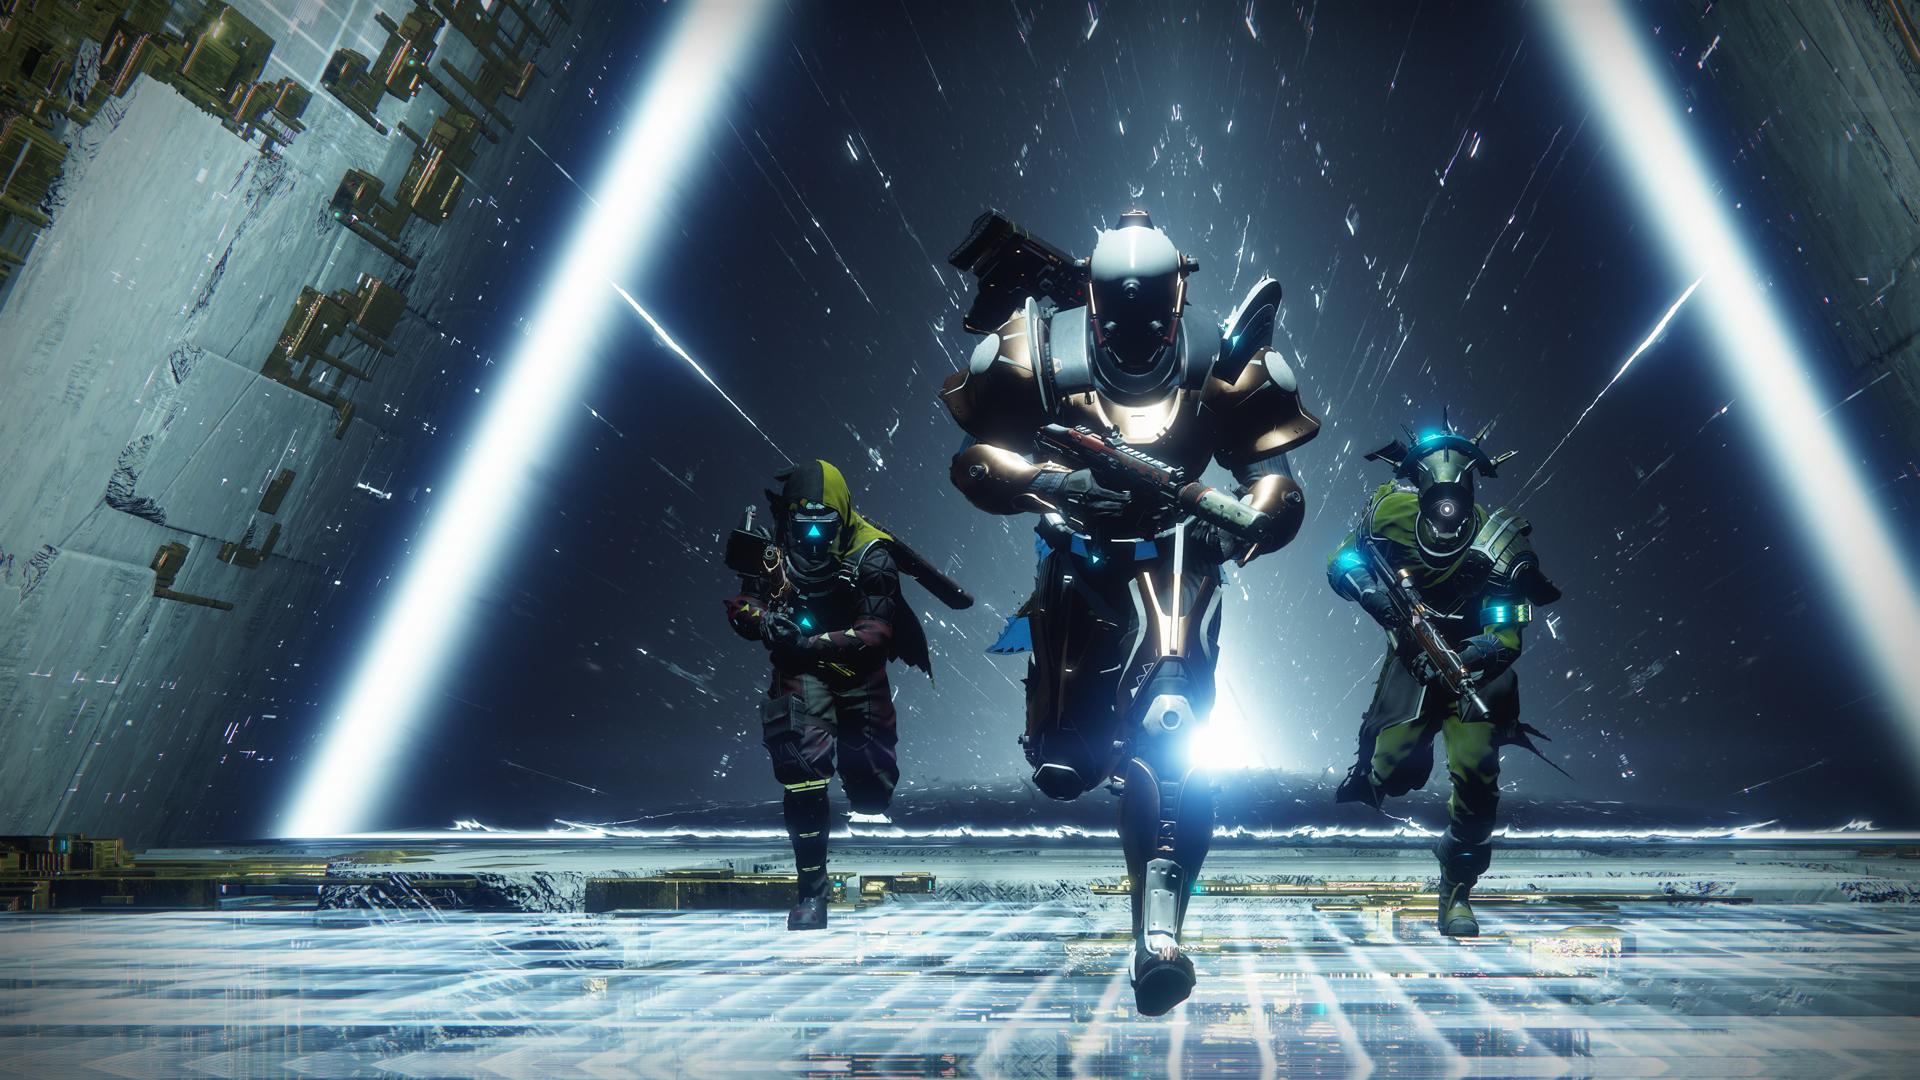 Destiny 2: Curse of Osiris - this massive Vex machine ...